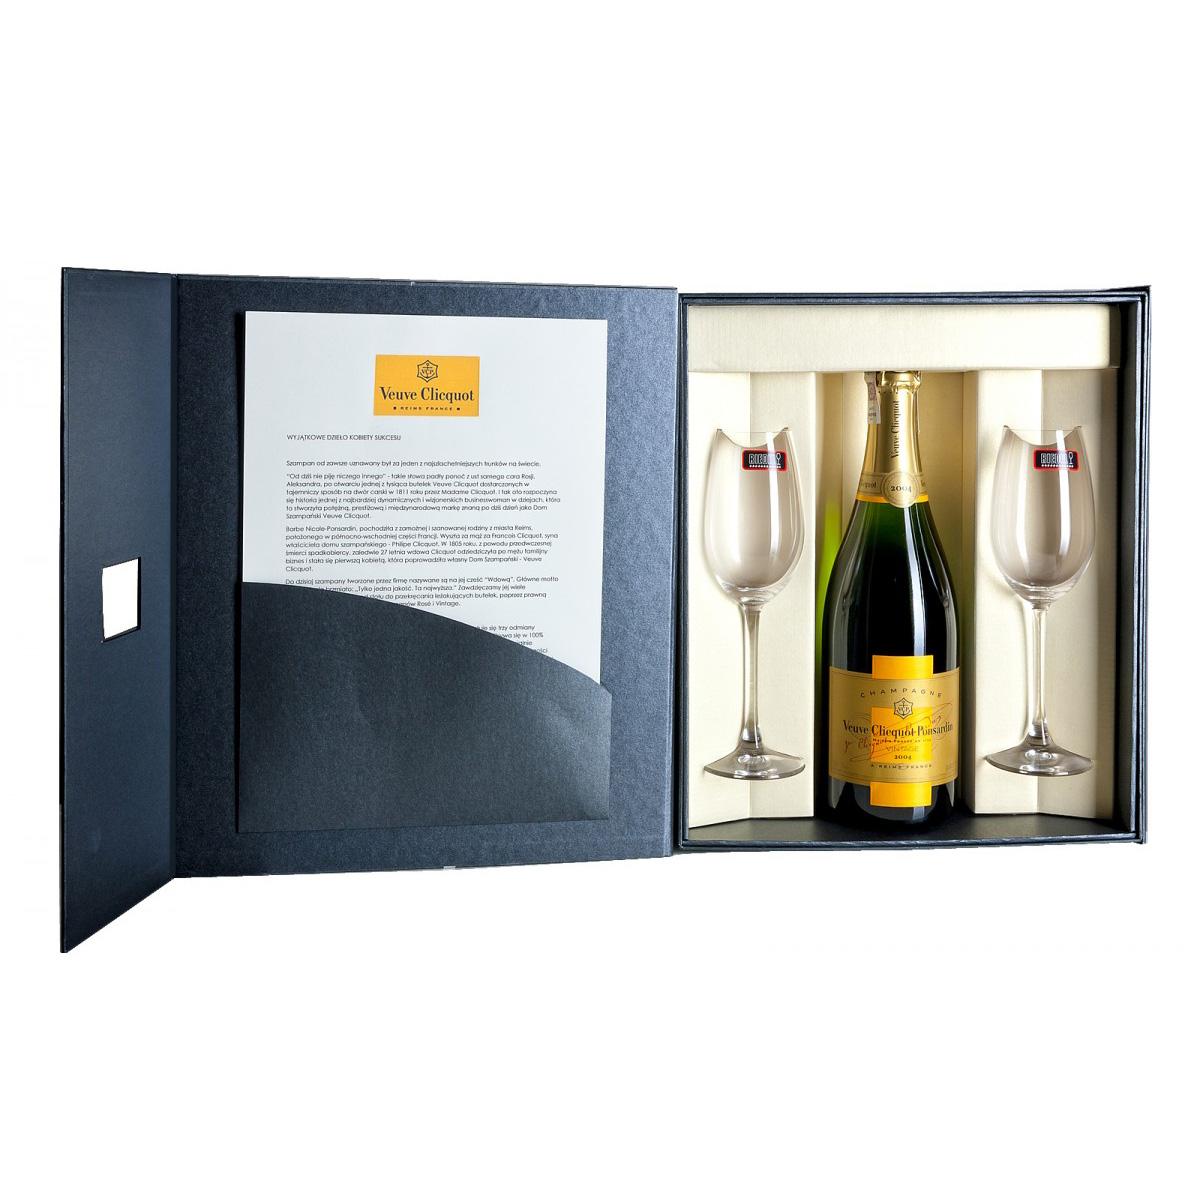 Zestaw prezentowy luksusowy - Veuve Clicquot Vintage 2008